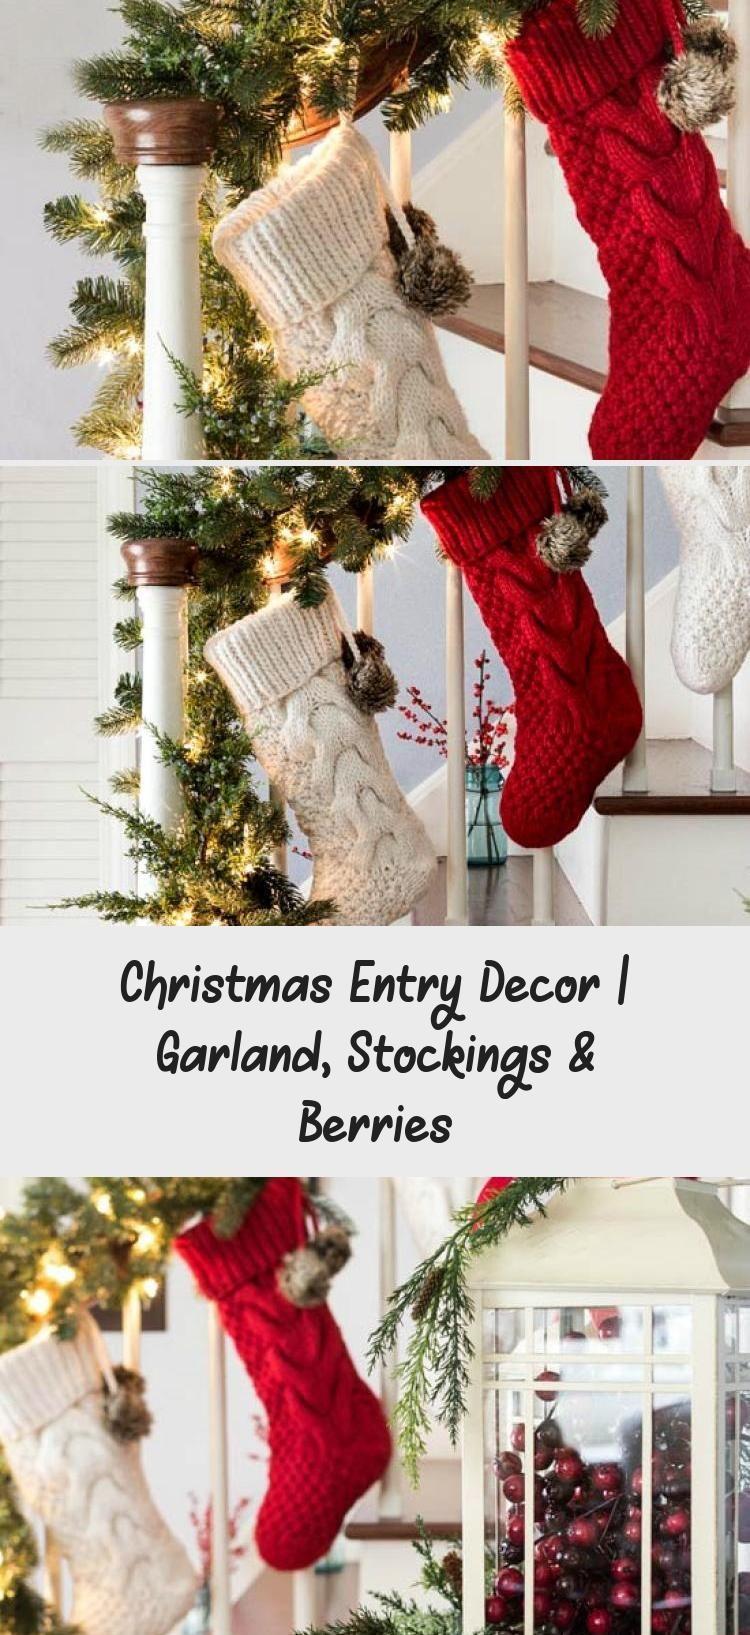 Christmas Entry Decor Garland Stockings Berries Home Decor Diy Christmas Entry Decor Garland St In 2020 Christmas Entry Entry Decor Woodland Christmas Decor